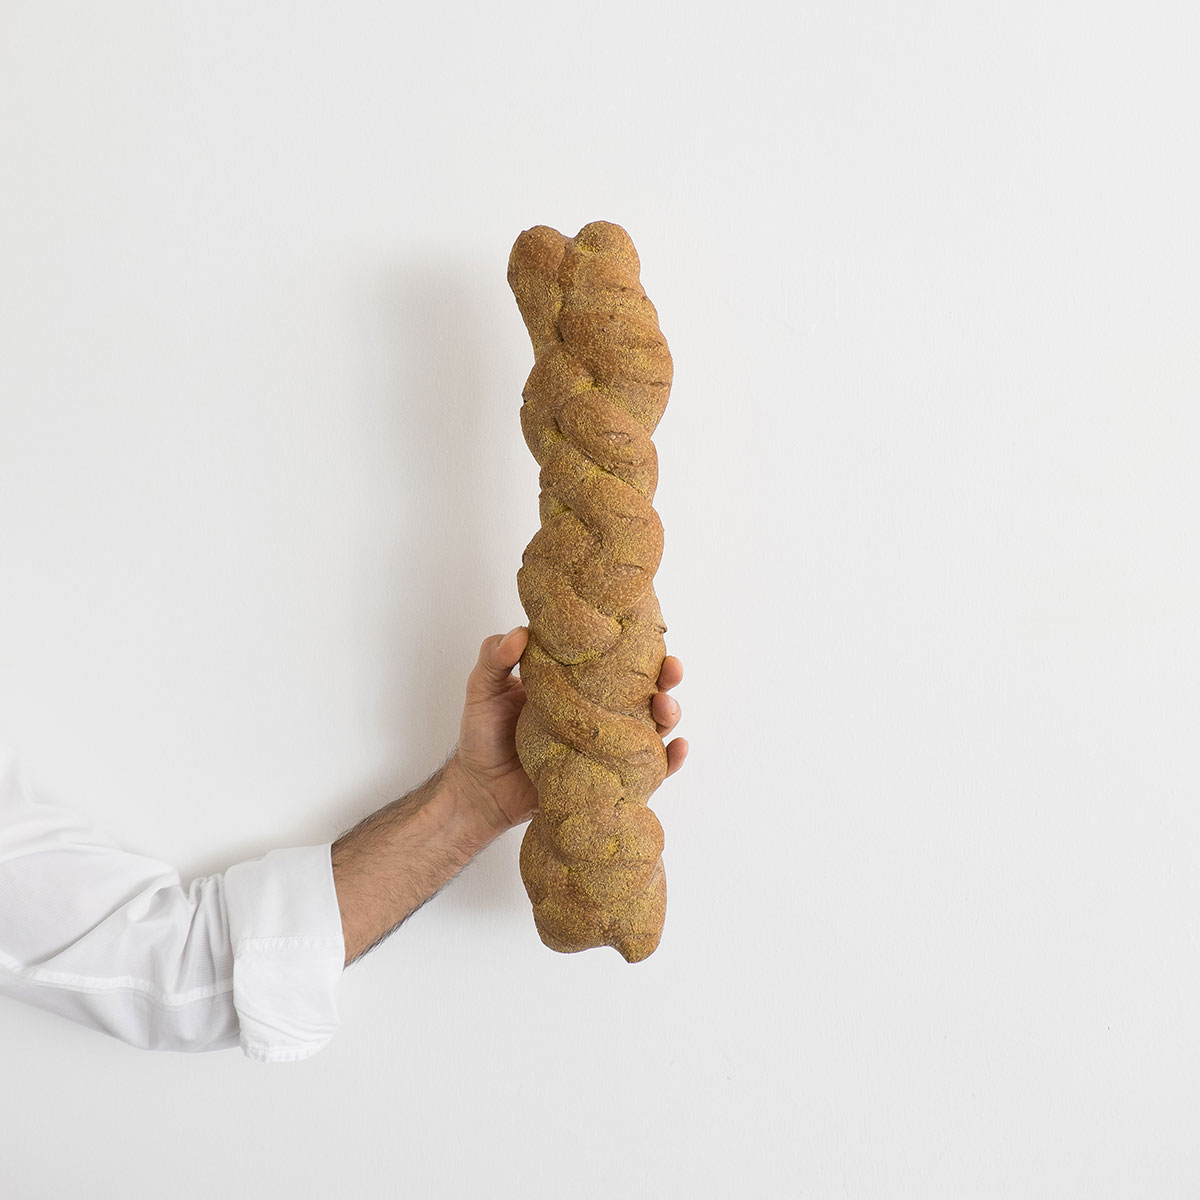 treccia-pane.jpg